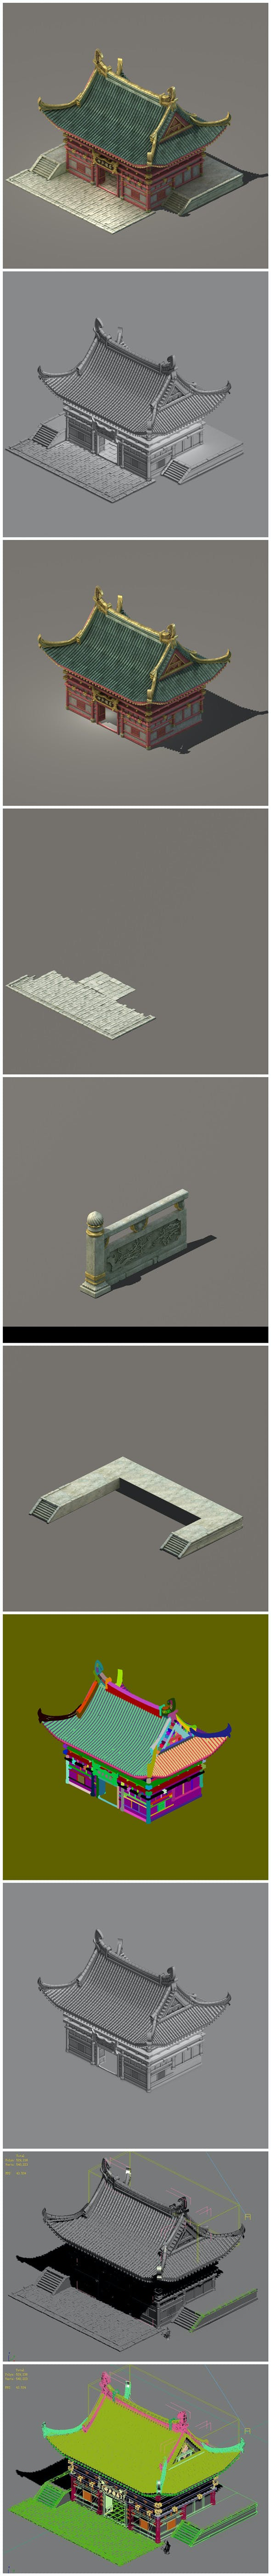 City Building - Escort 032 - 3DOcean Item for Sale